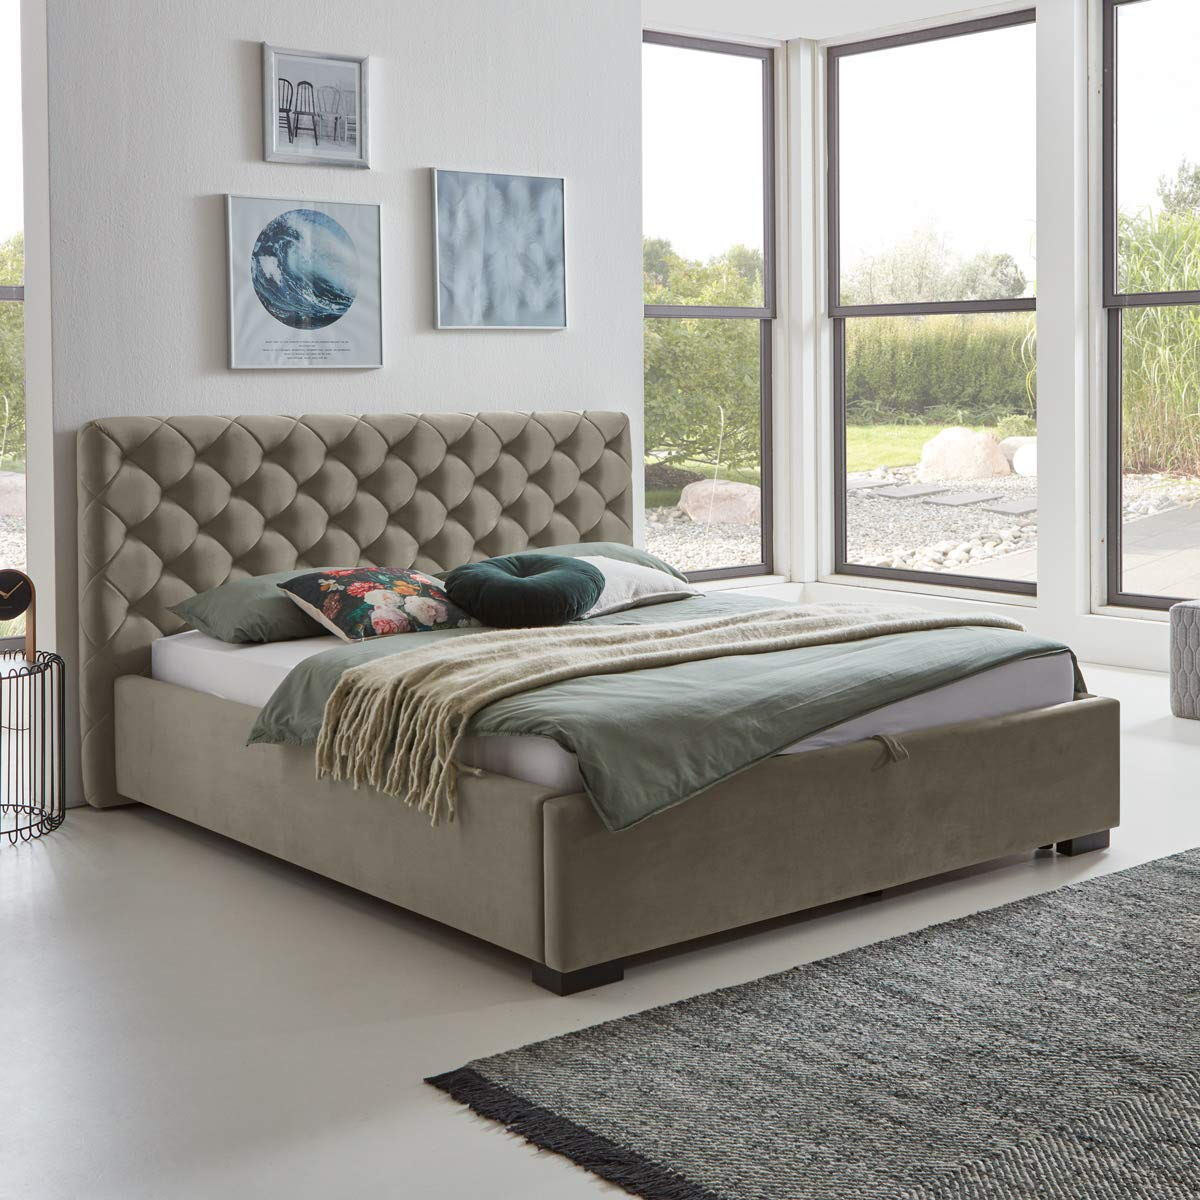 Designer Bett Mit Bettkasten Elsa Samt Stoff Polsterbett Lattenrost Doppelbett Stauraum Holzfuß Schwarz Taupe 140 X 200 Cm